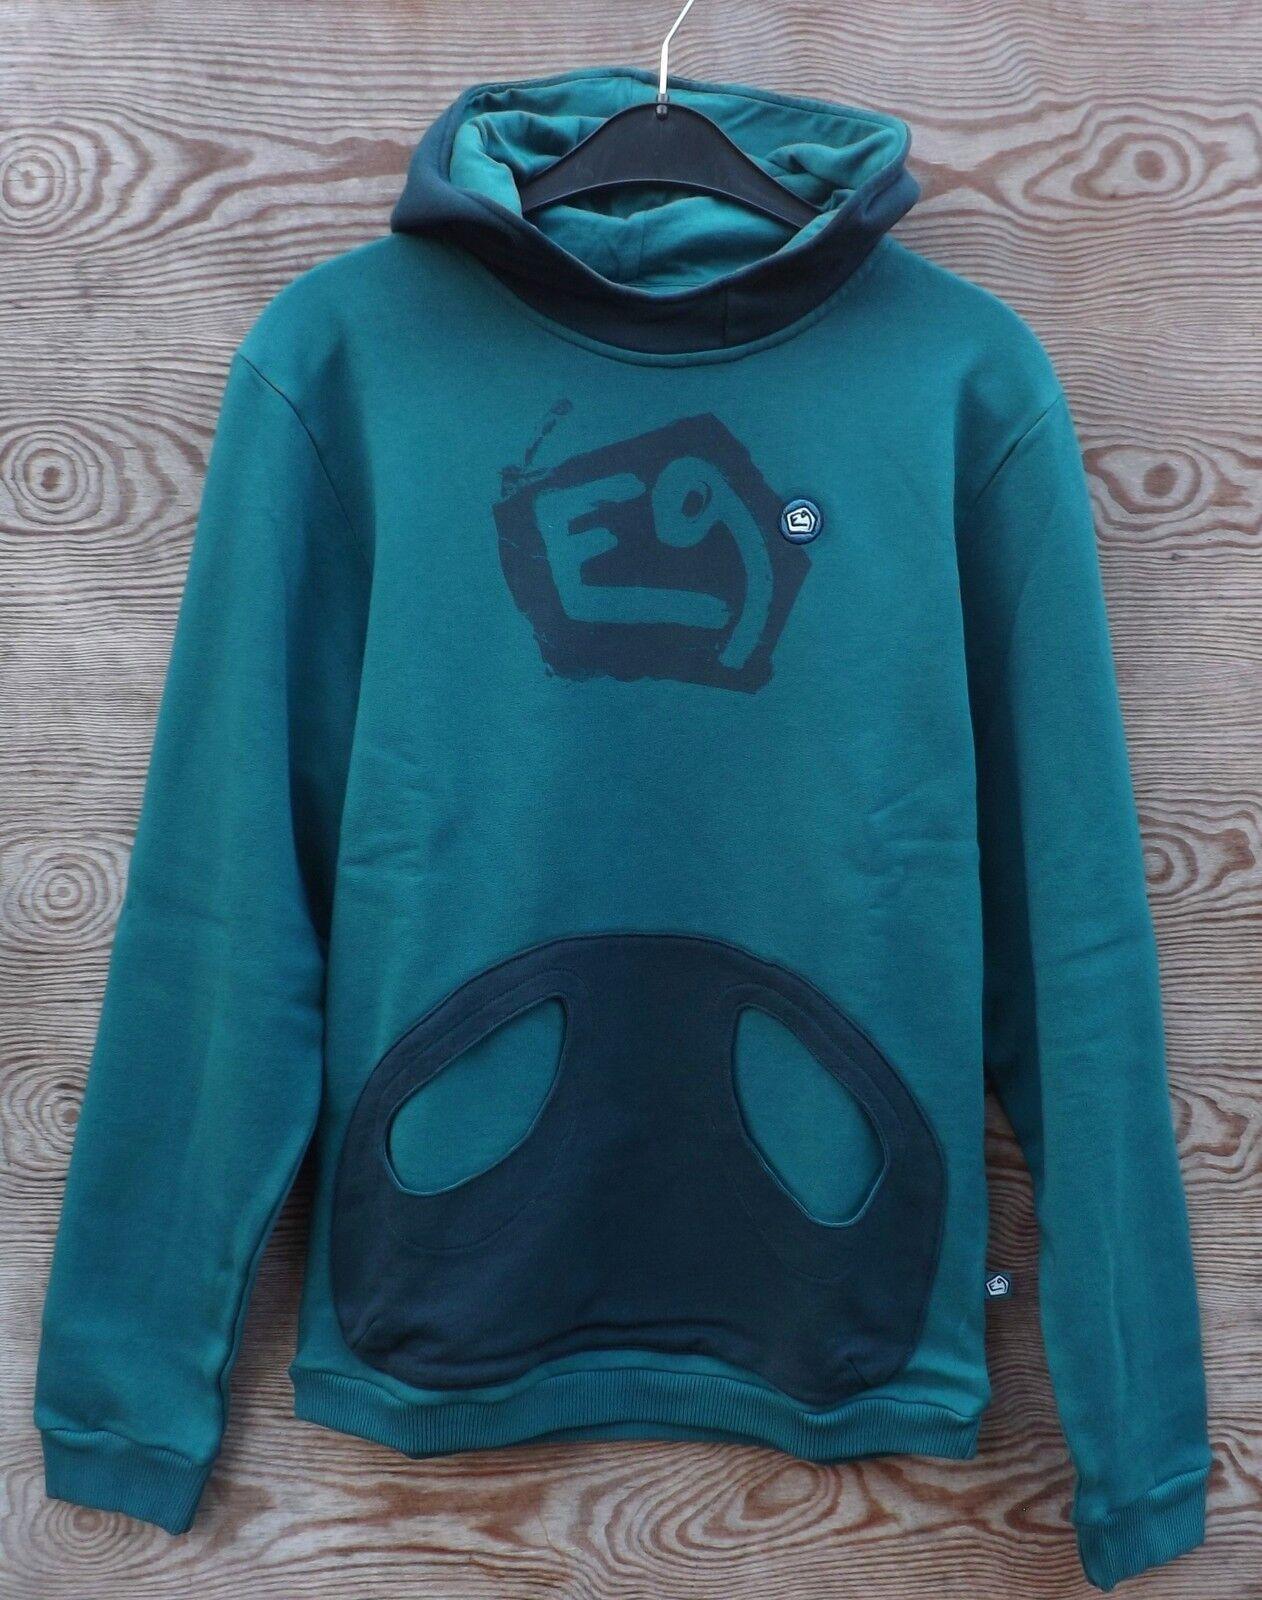 E9 caobi - jersey capucha para hombre, petrol-iron